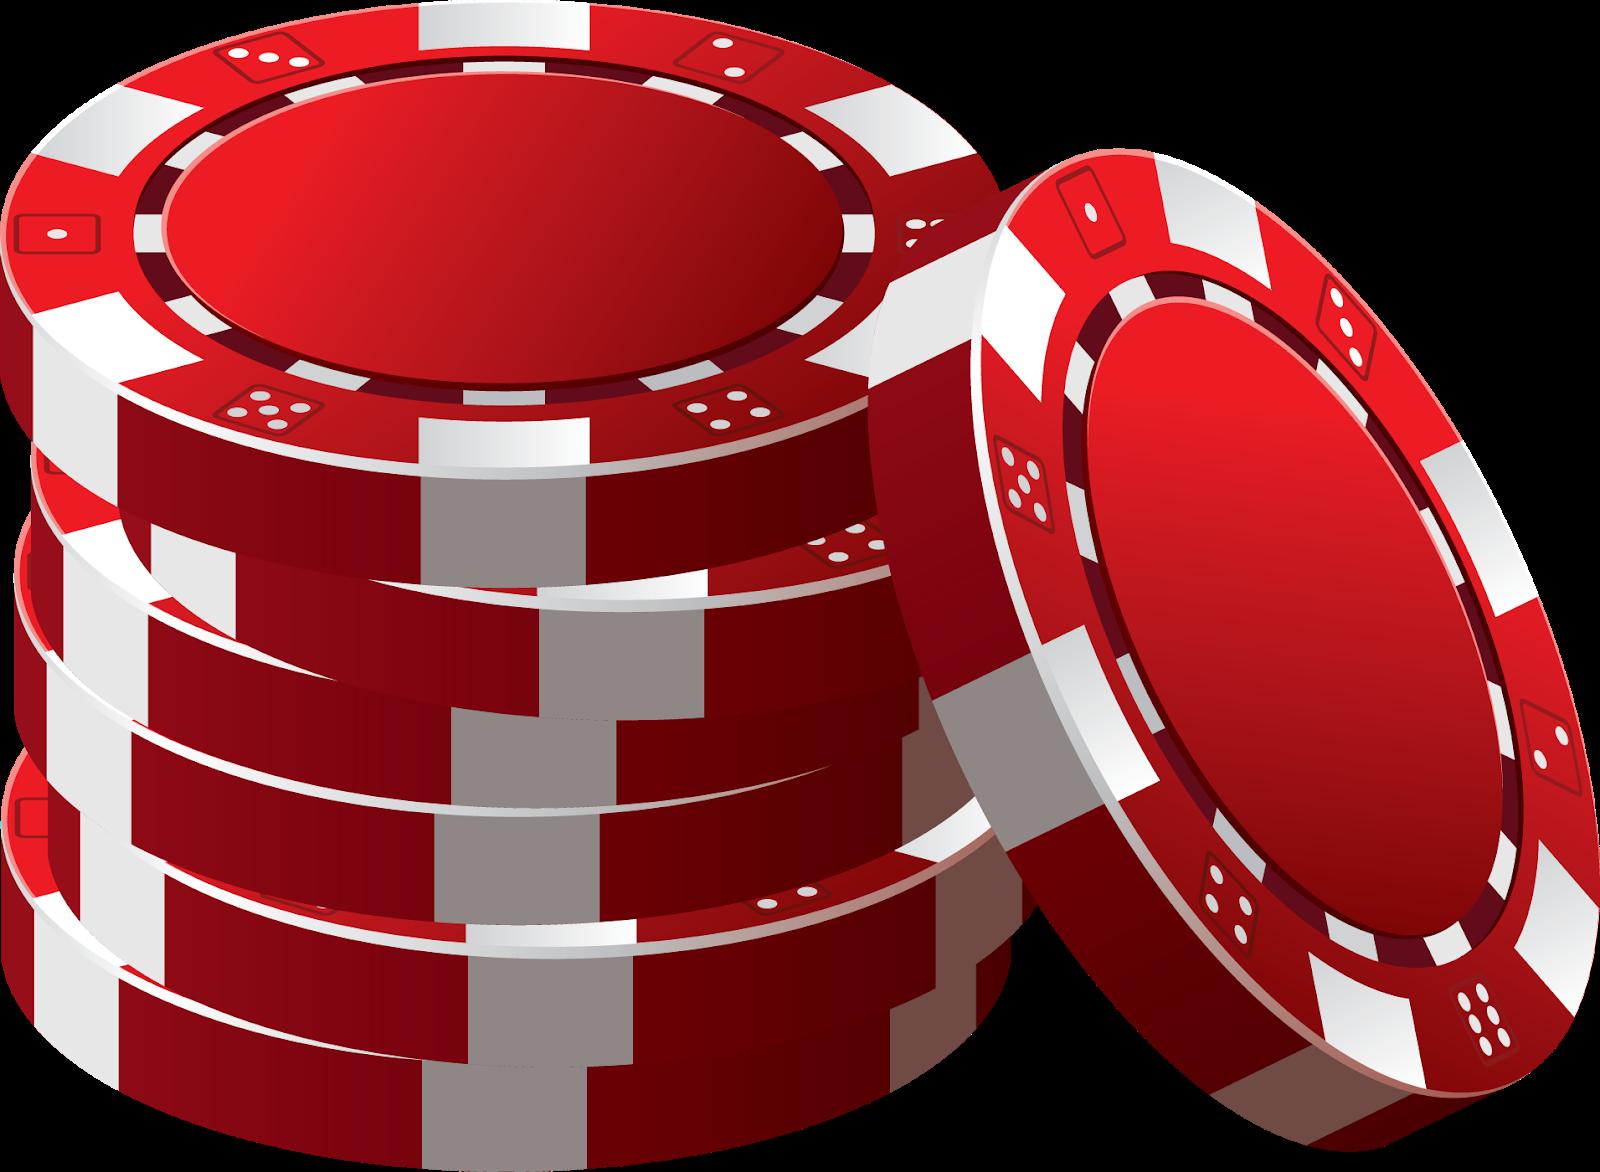 Ttr casino бонус код